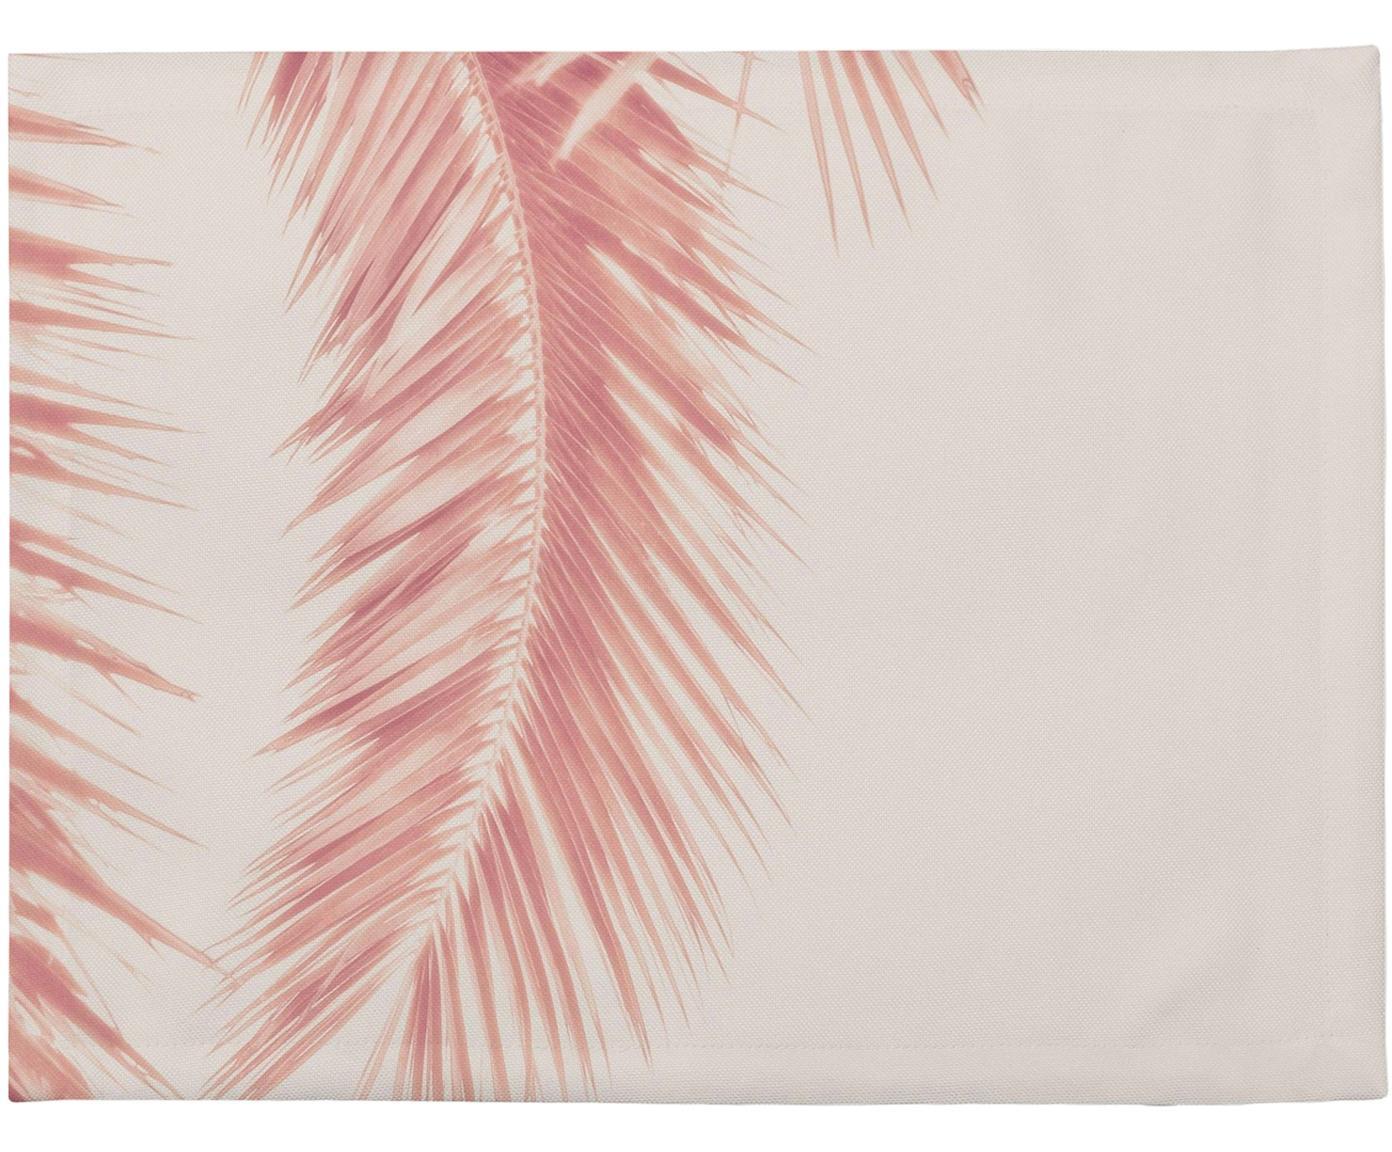 Tovaglietta americana Palm Leaves 4 pz, Poliestere, Tonalità rosa, Larg. 35 x Lung. 45 cm